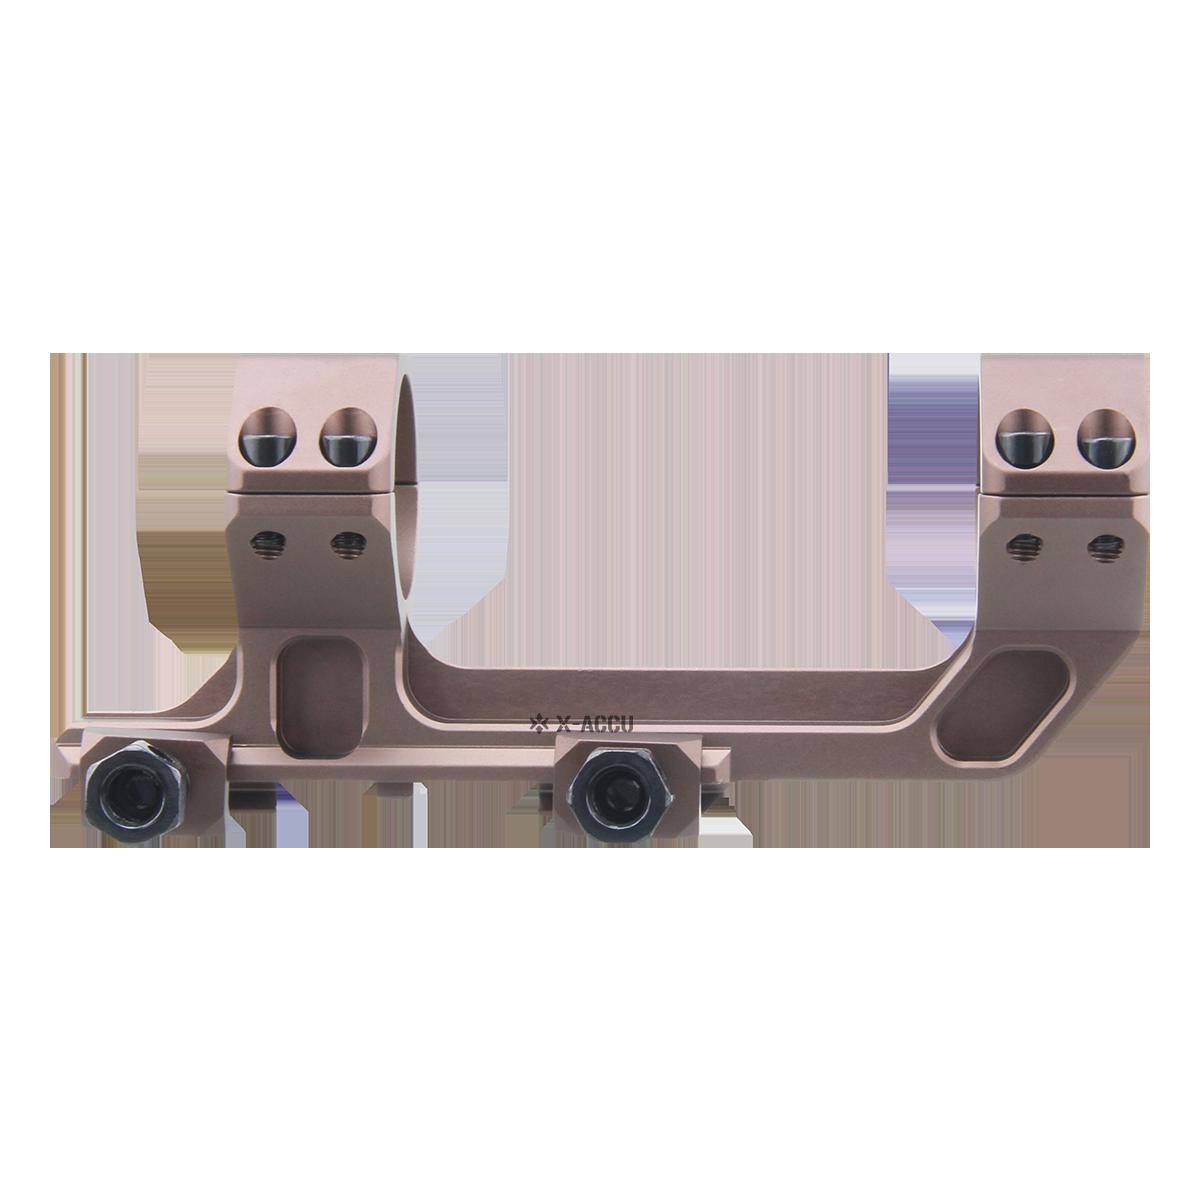 Vector Optics XASR-3035 X-Accu 30mm 1-Piece Extended Picatinny AR Mount FDE